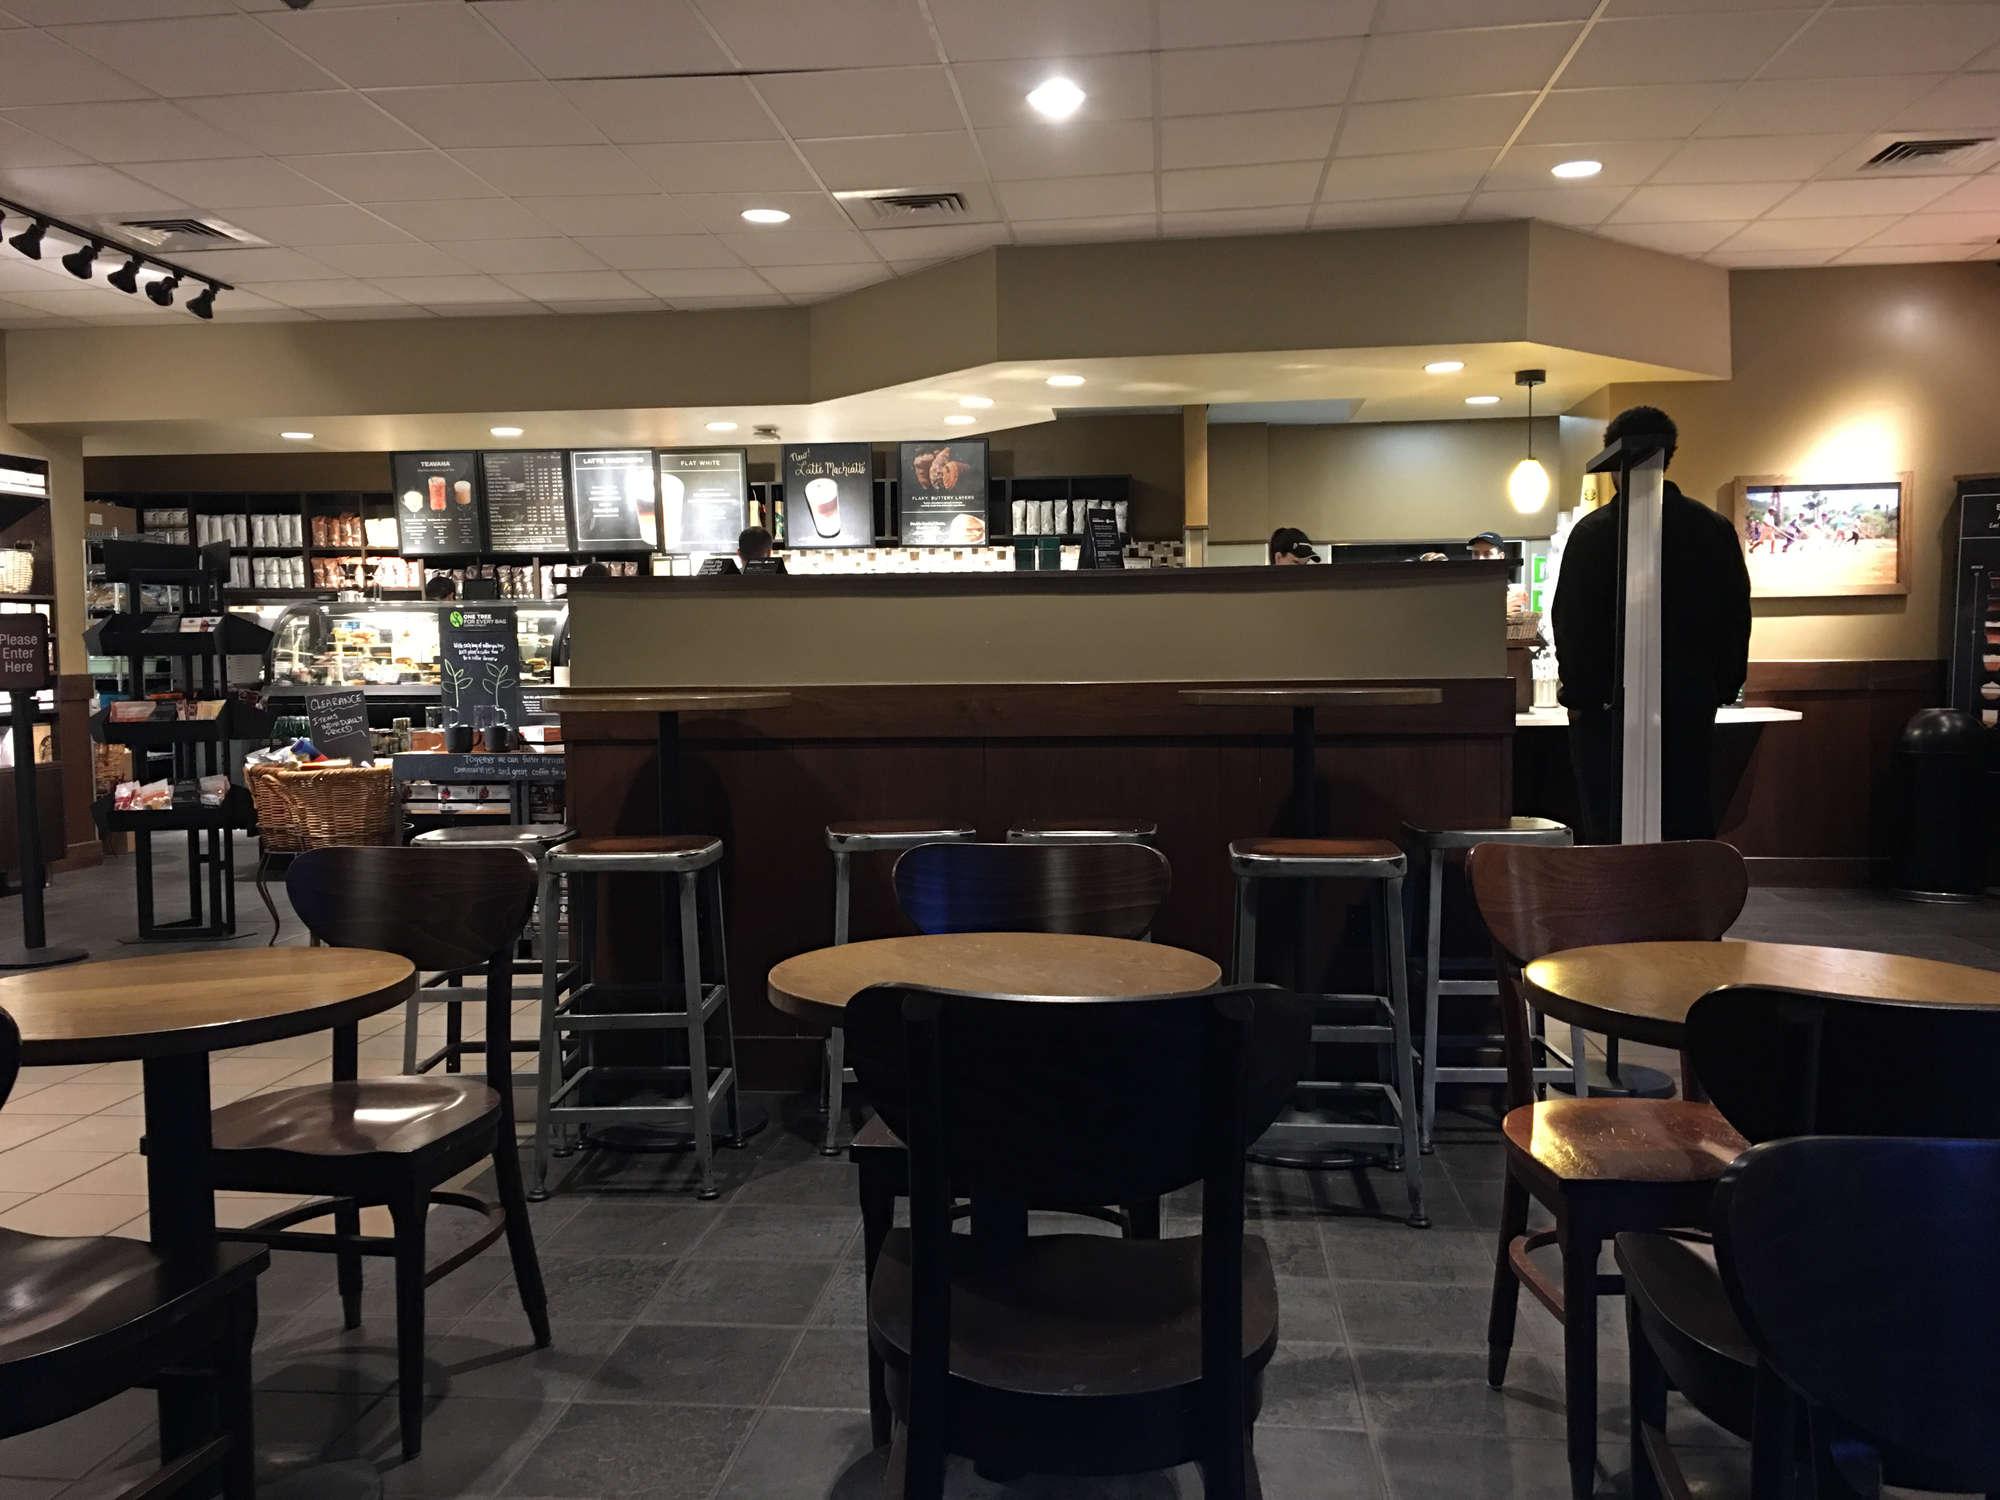 Starbucks in Raleigh